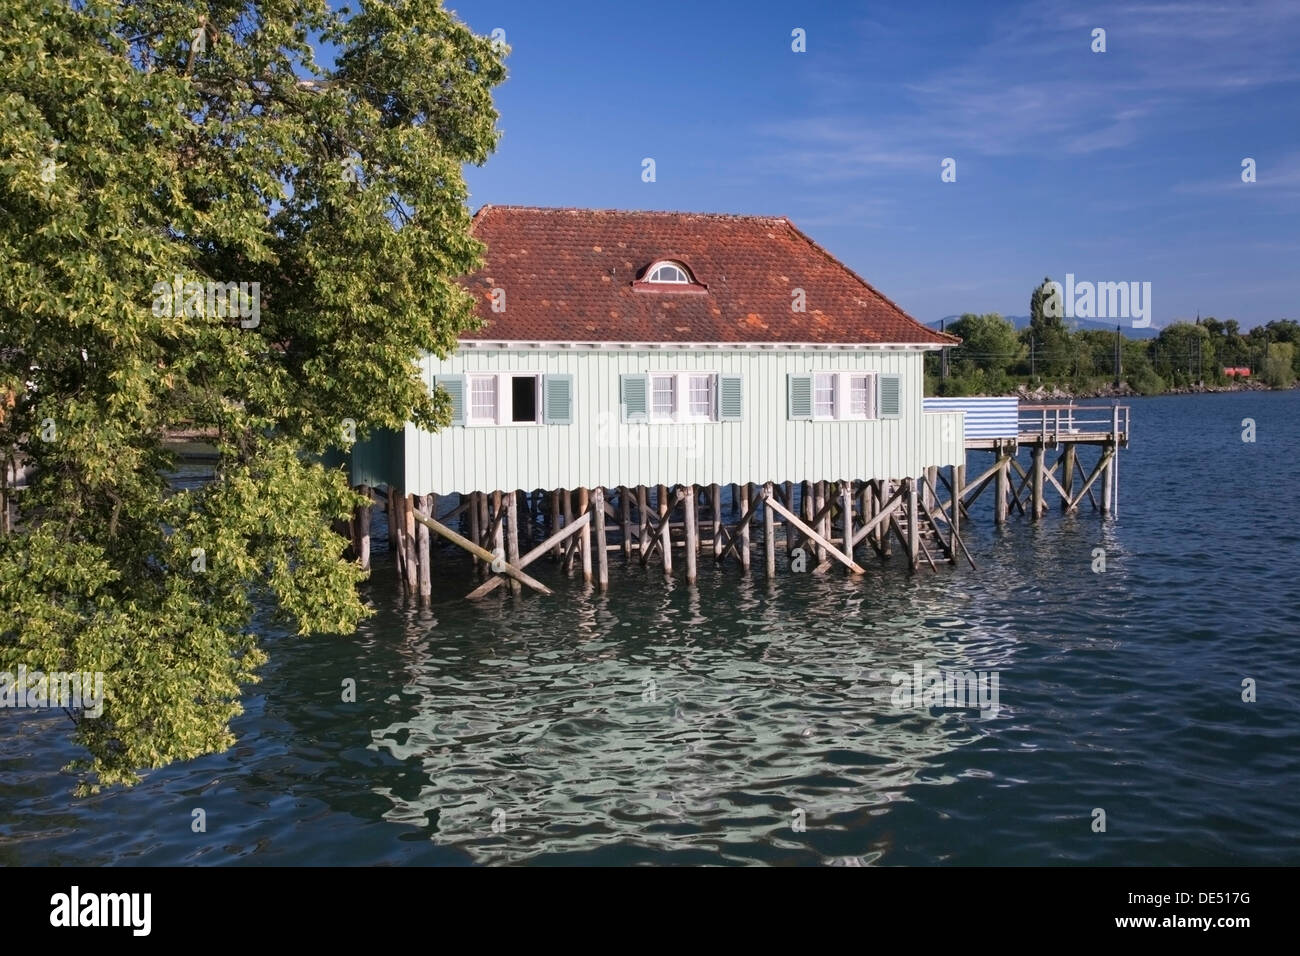 Pile dwelling, house on stilts, near Lindau, Lake Constance, Bavaria - Stock Image